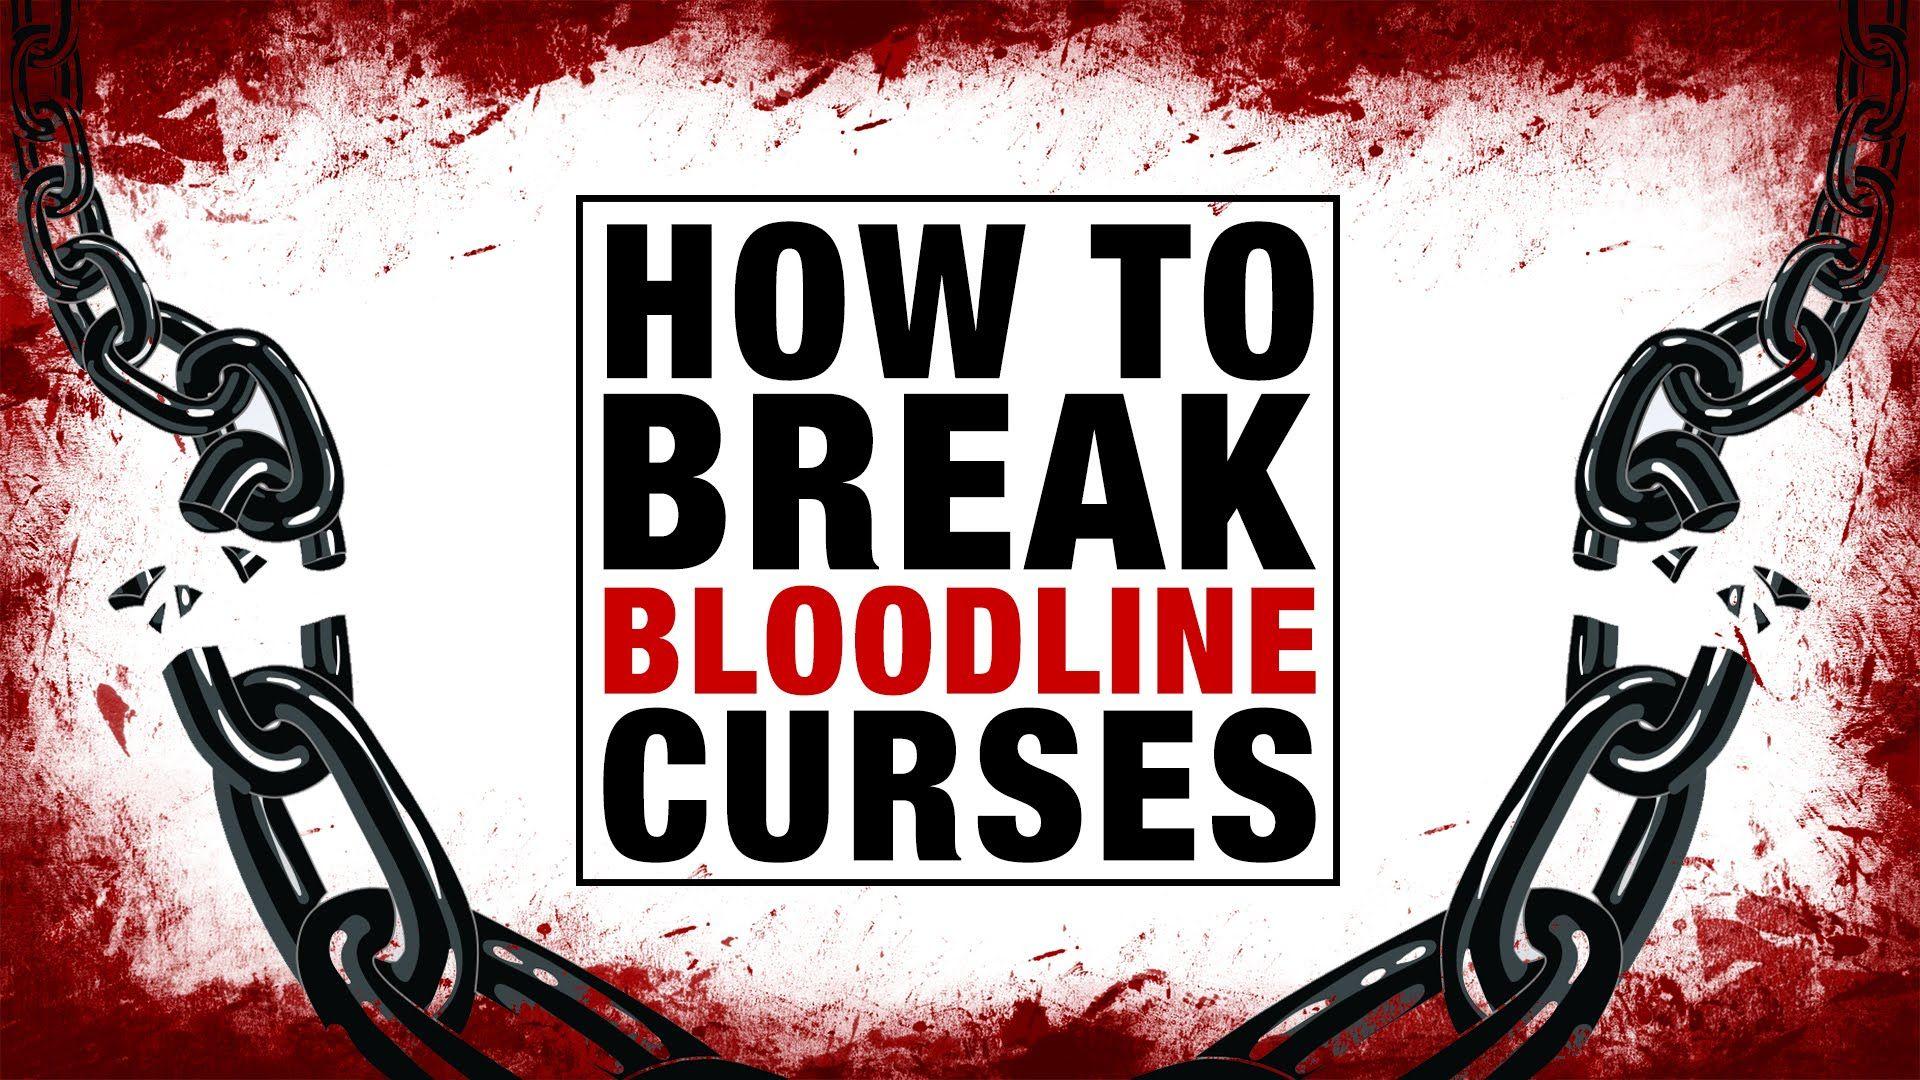 How To Break Generational Bloodline Curses | John Turnipseed on Sid